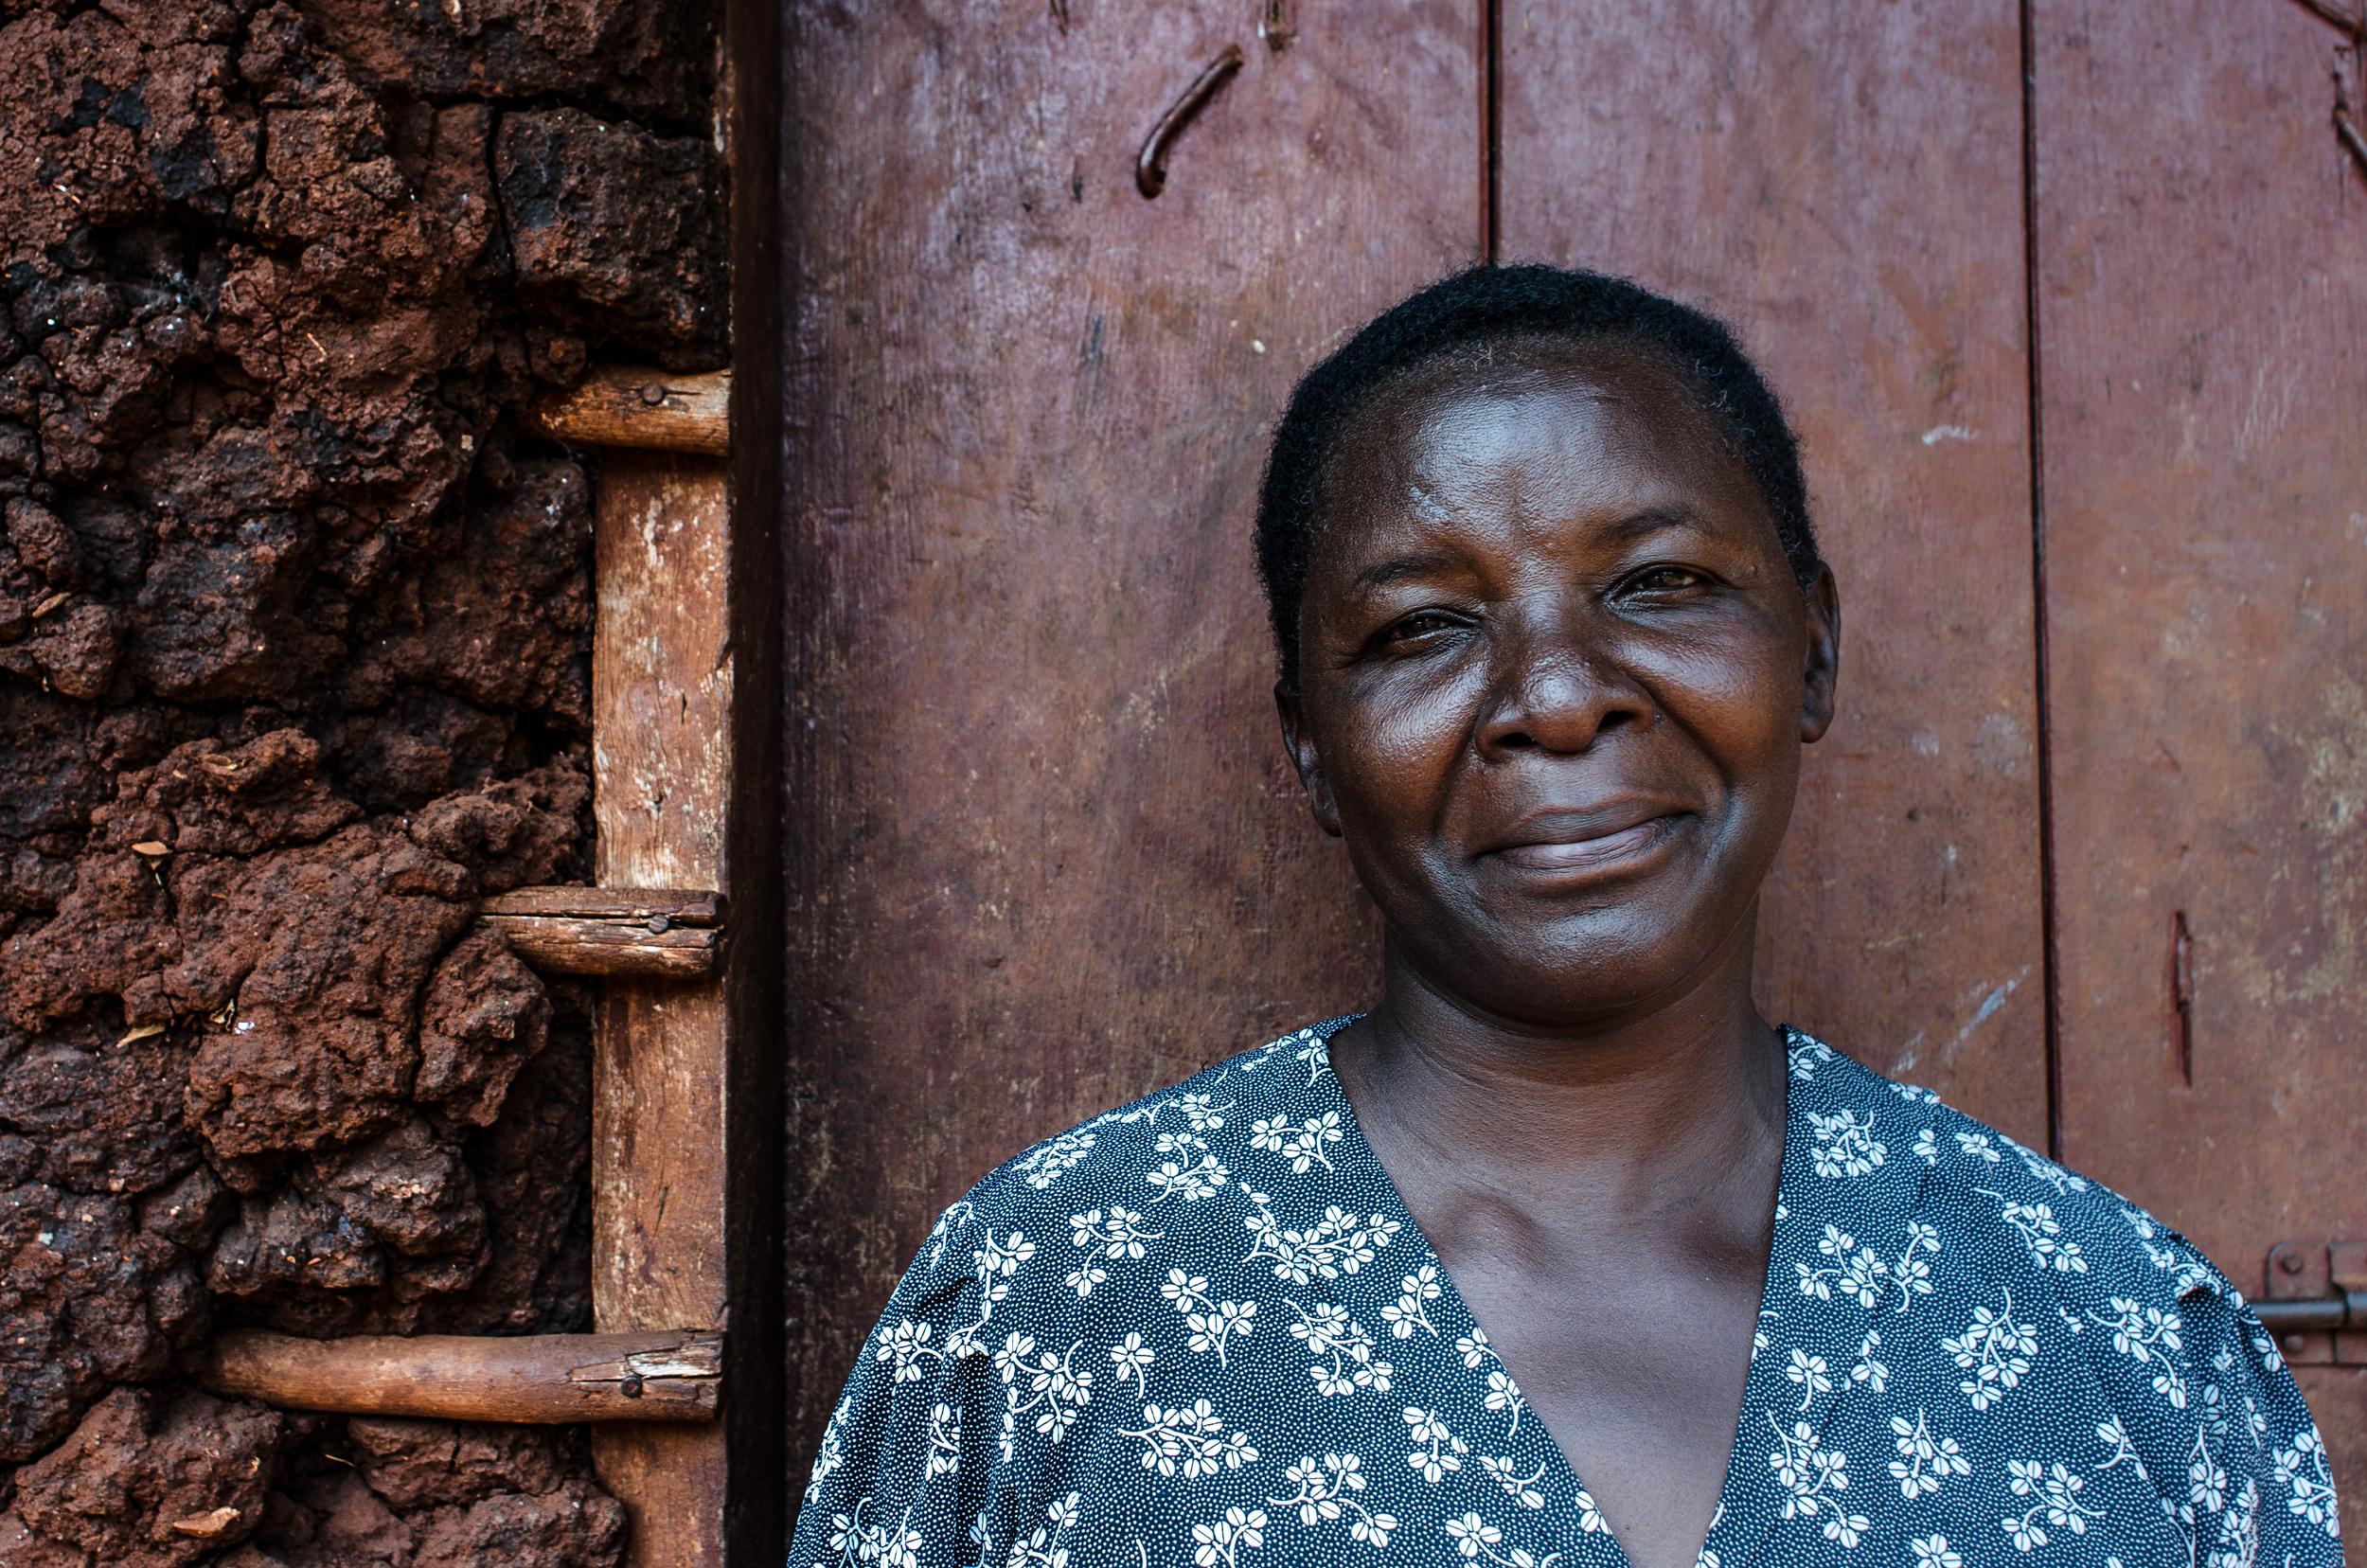 uganda_2014_homeofhope-19.jpg